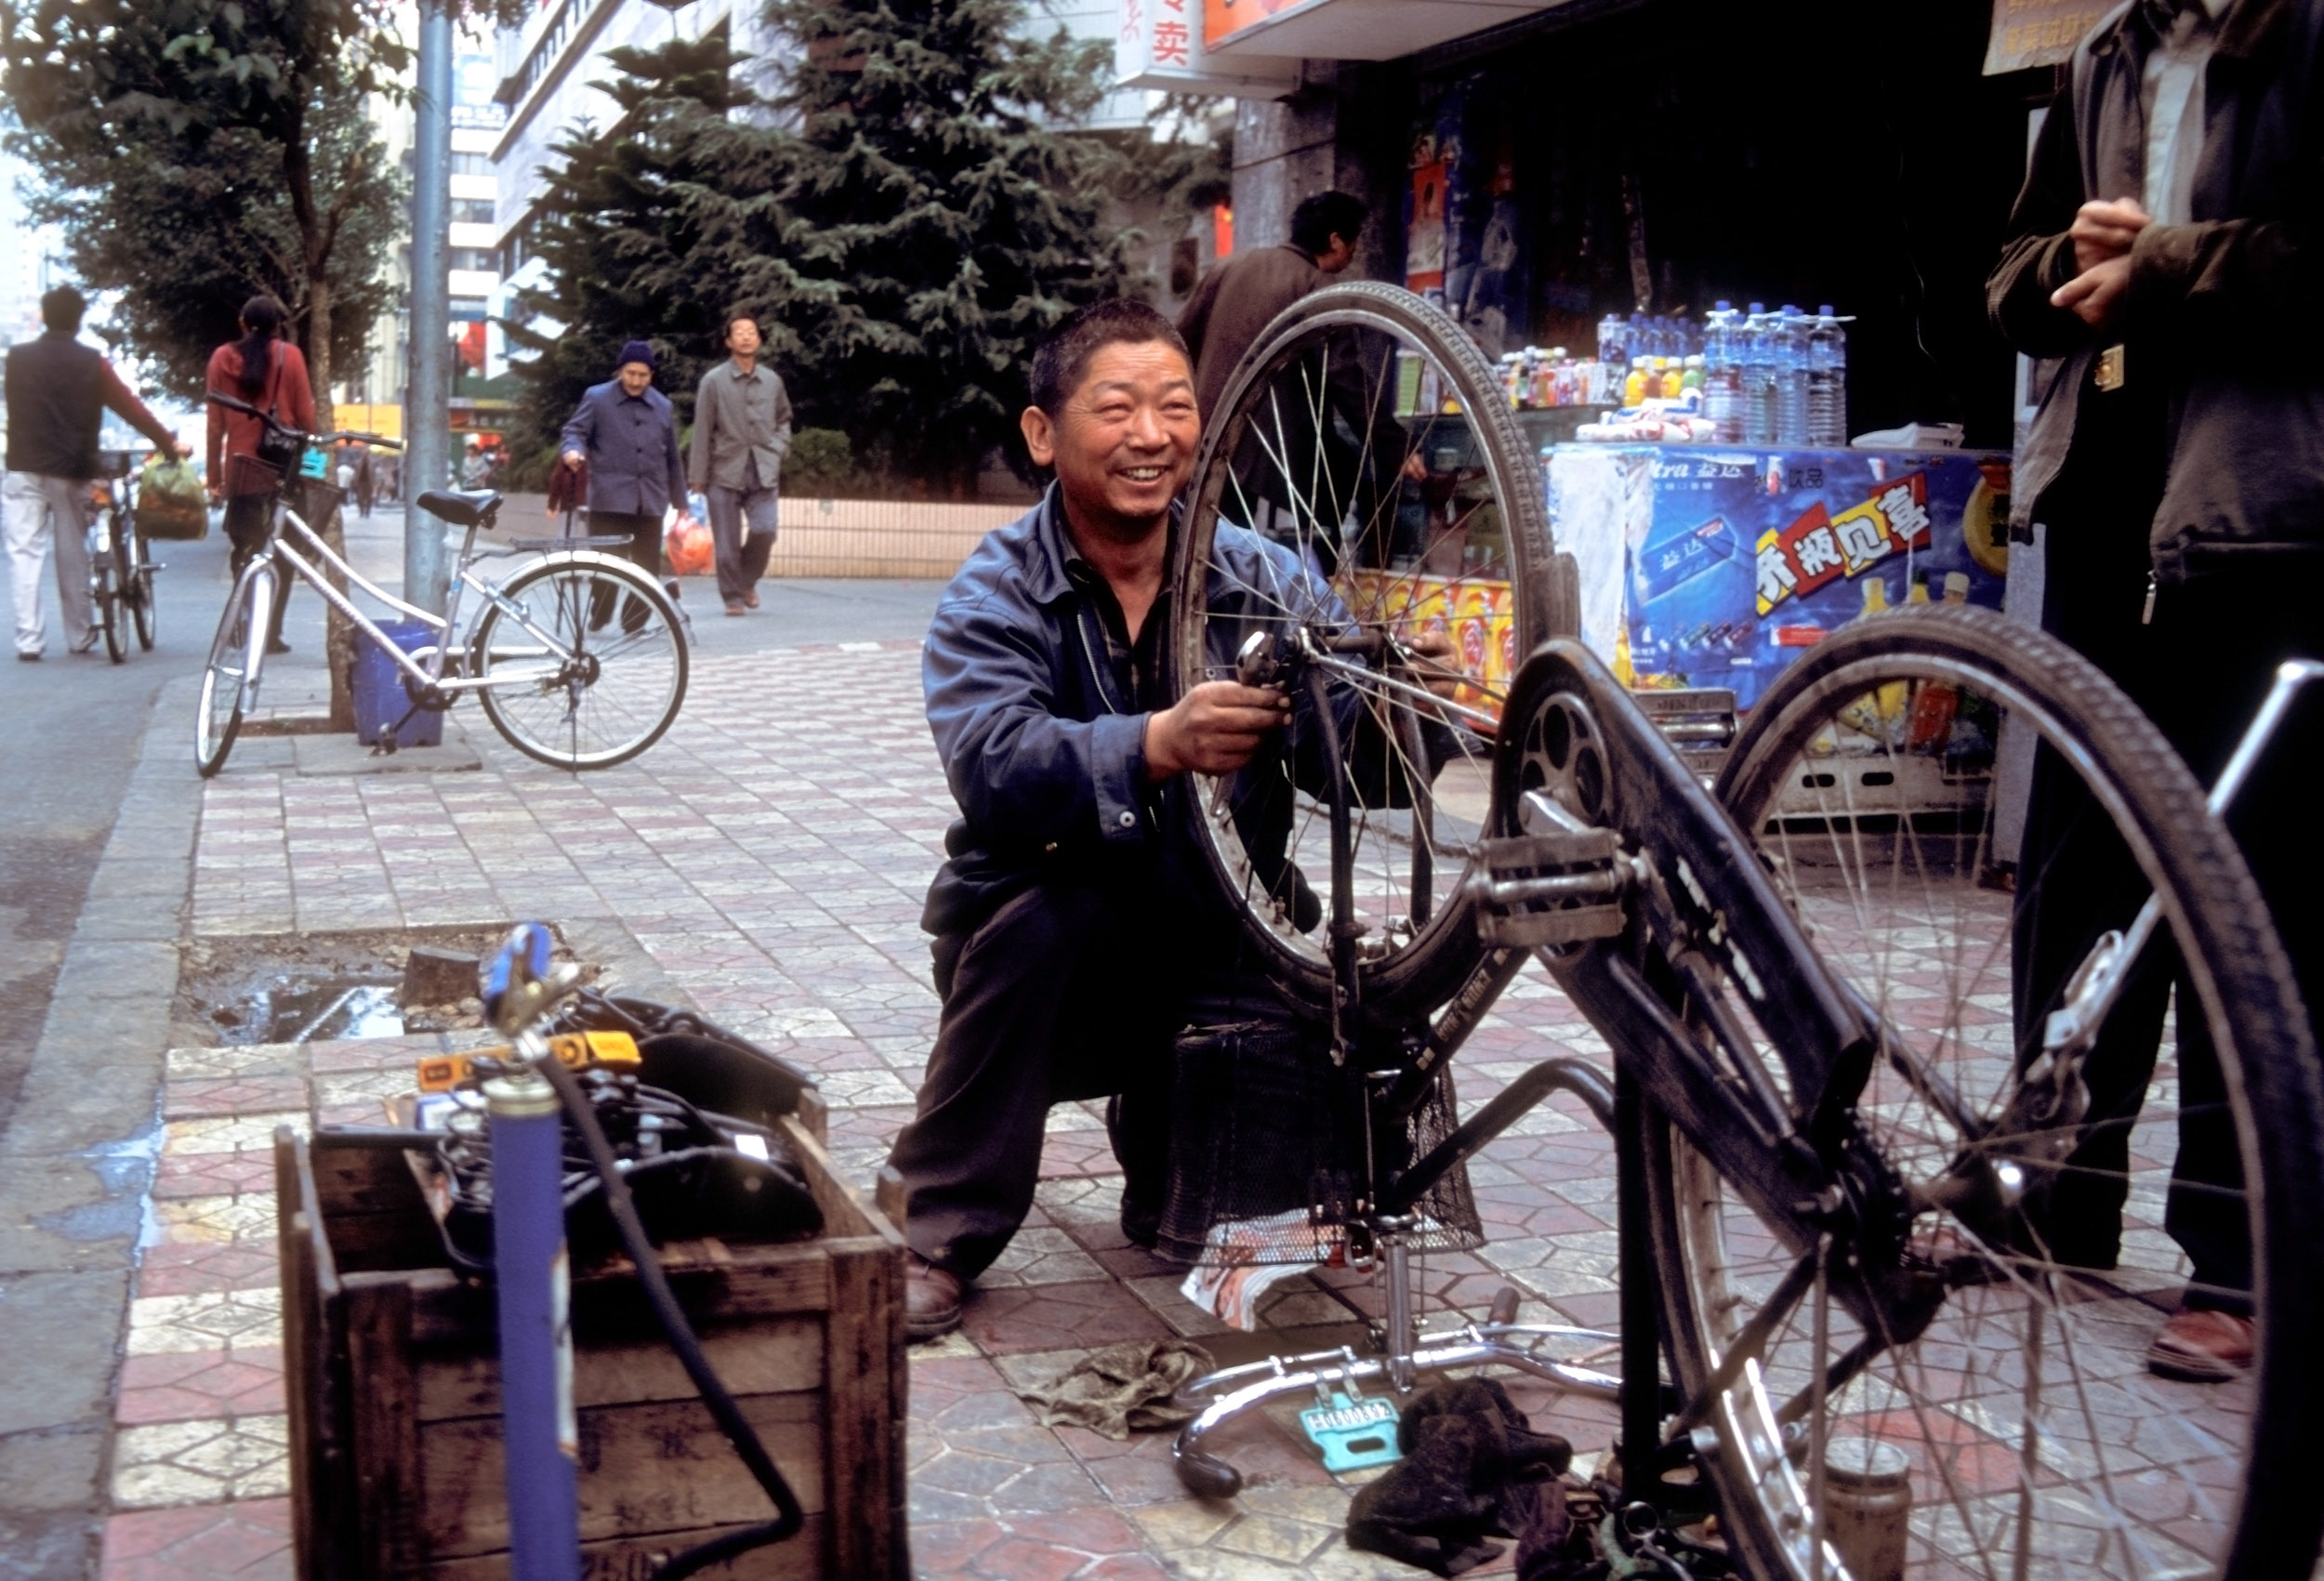 © Kevin Landwer-Johan. Bike repairs in the street in China